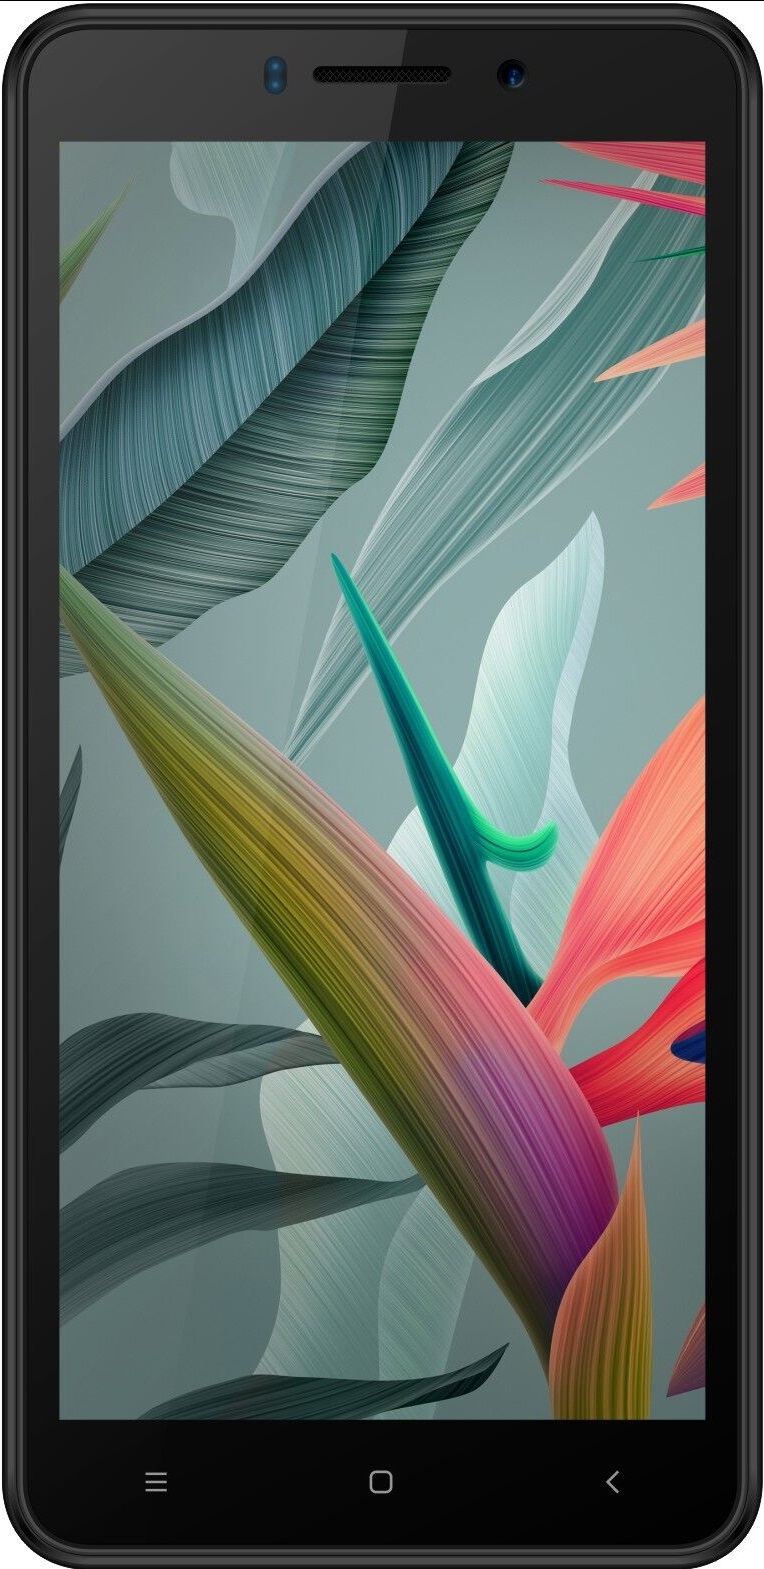 Смартфон Oukitel C10 1/8GB, серый смартфон oukitel u18 gold 8 core 1 5ghz 4gb 64gb 5 5 1920 1080 16mp 5mp 13mp 2sim 3g 4g bt wifi gps android